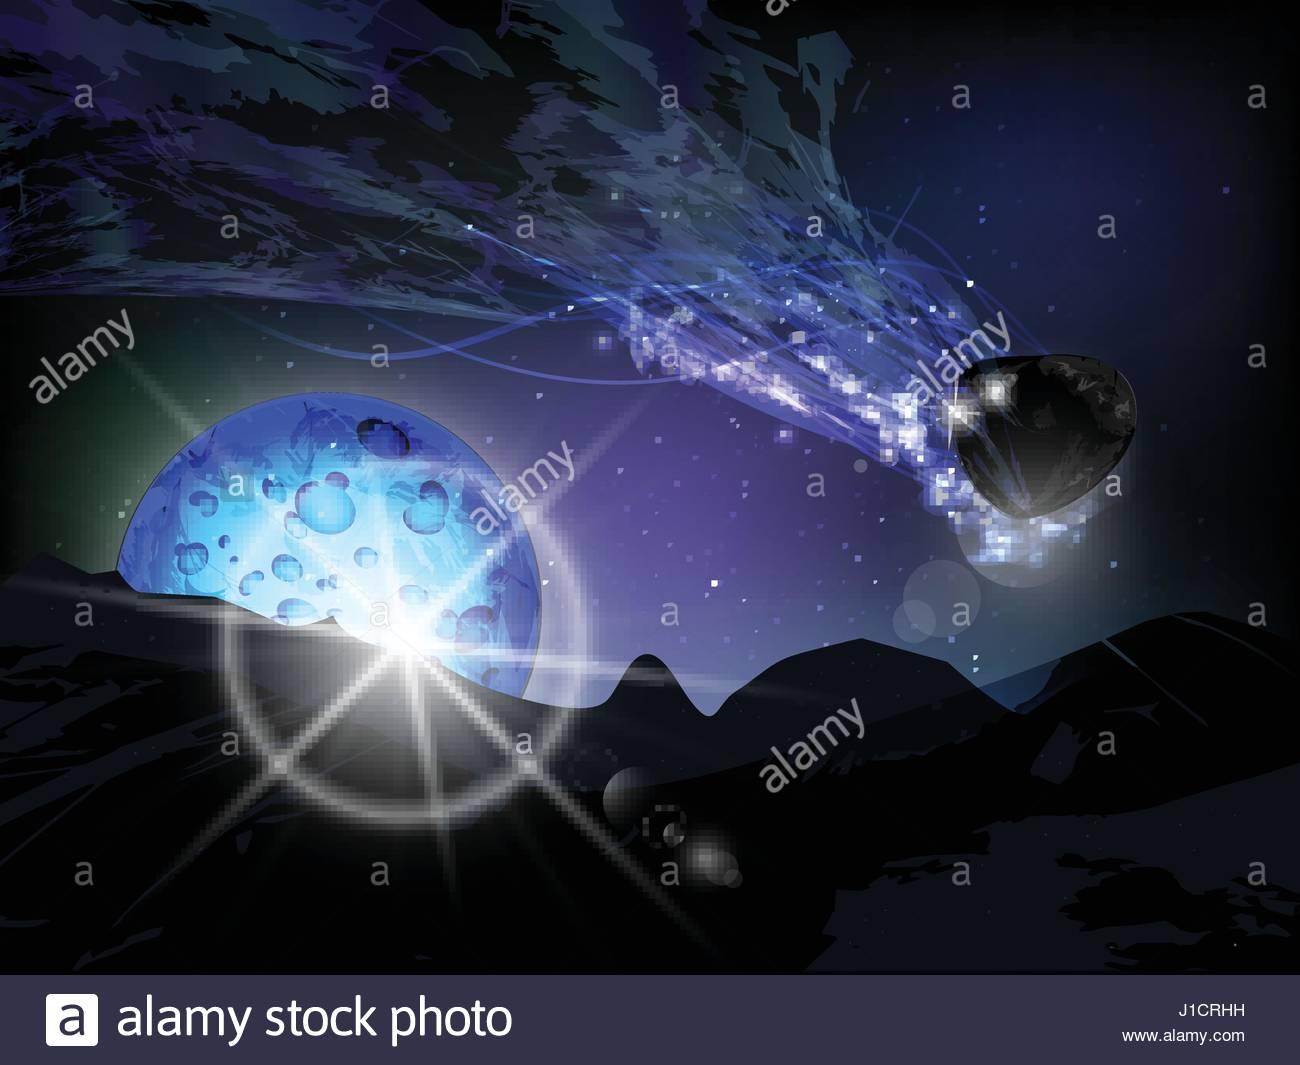 Intergalactic Civilization Stock Photos Intergalactic 1300x1065